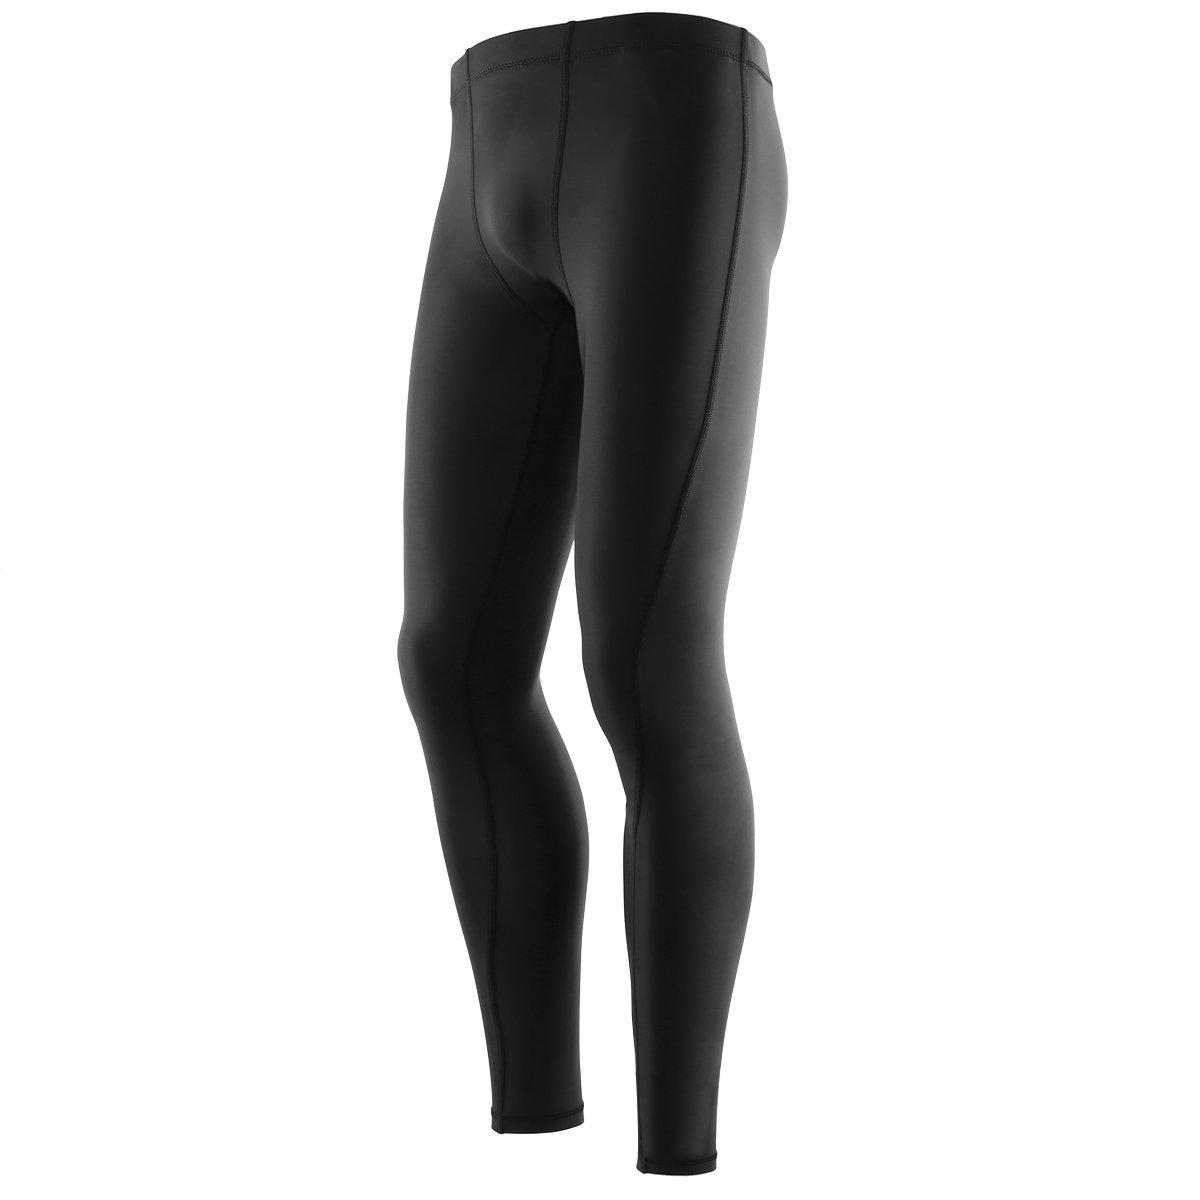 YAHA Mens Cool Dry Compression Base layer Pants Legging Long Tights